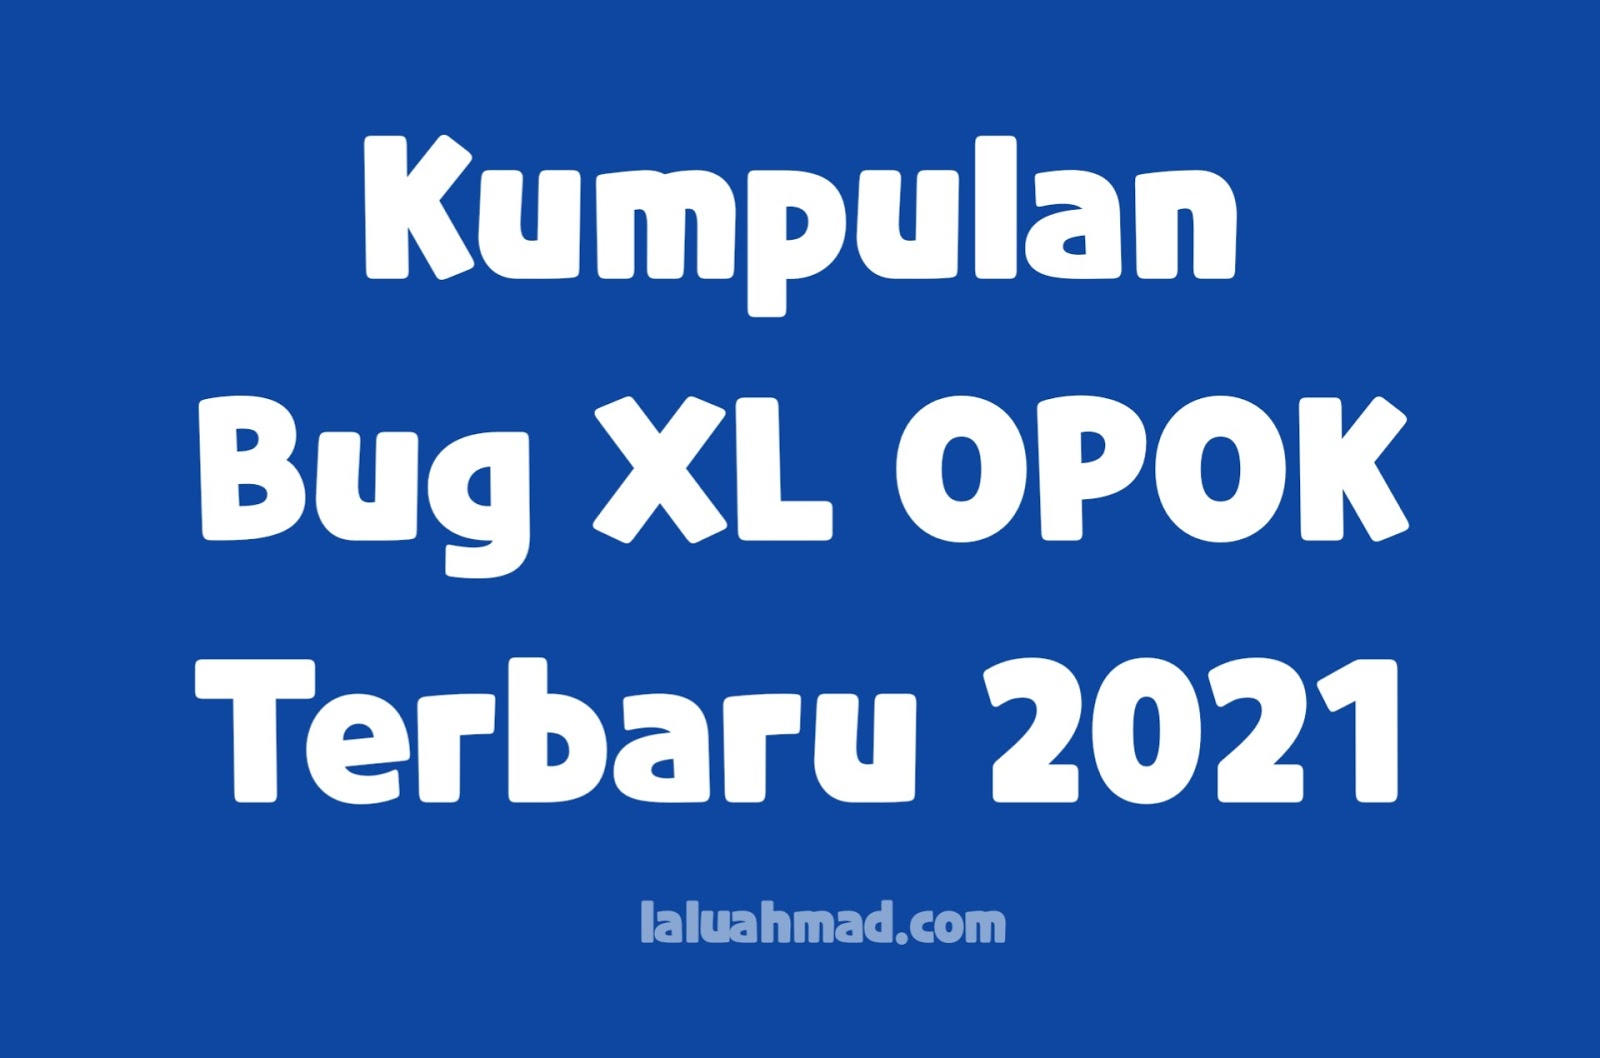 Kumpulan Bug XL OPOK Terbaru 2021